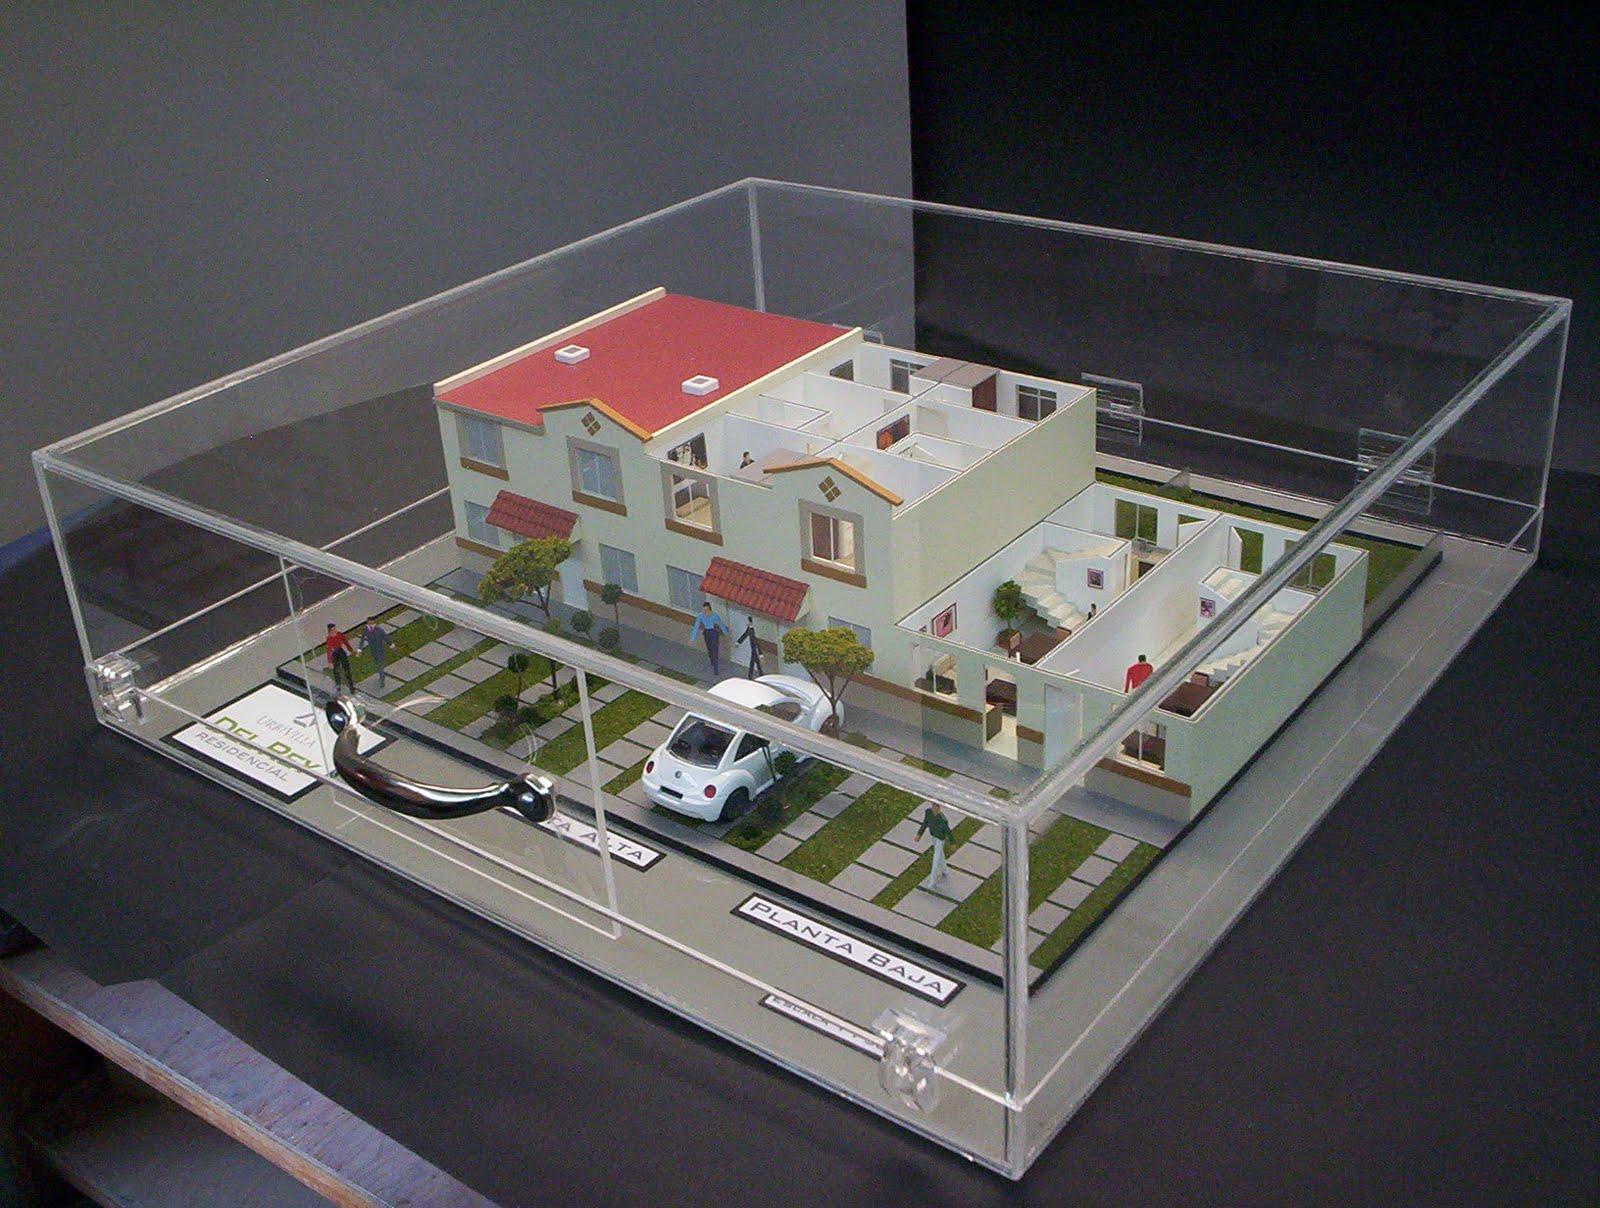 Maqueta de prototipo de Casa Habitación escala 1:50 montada en